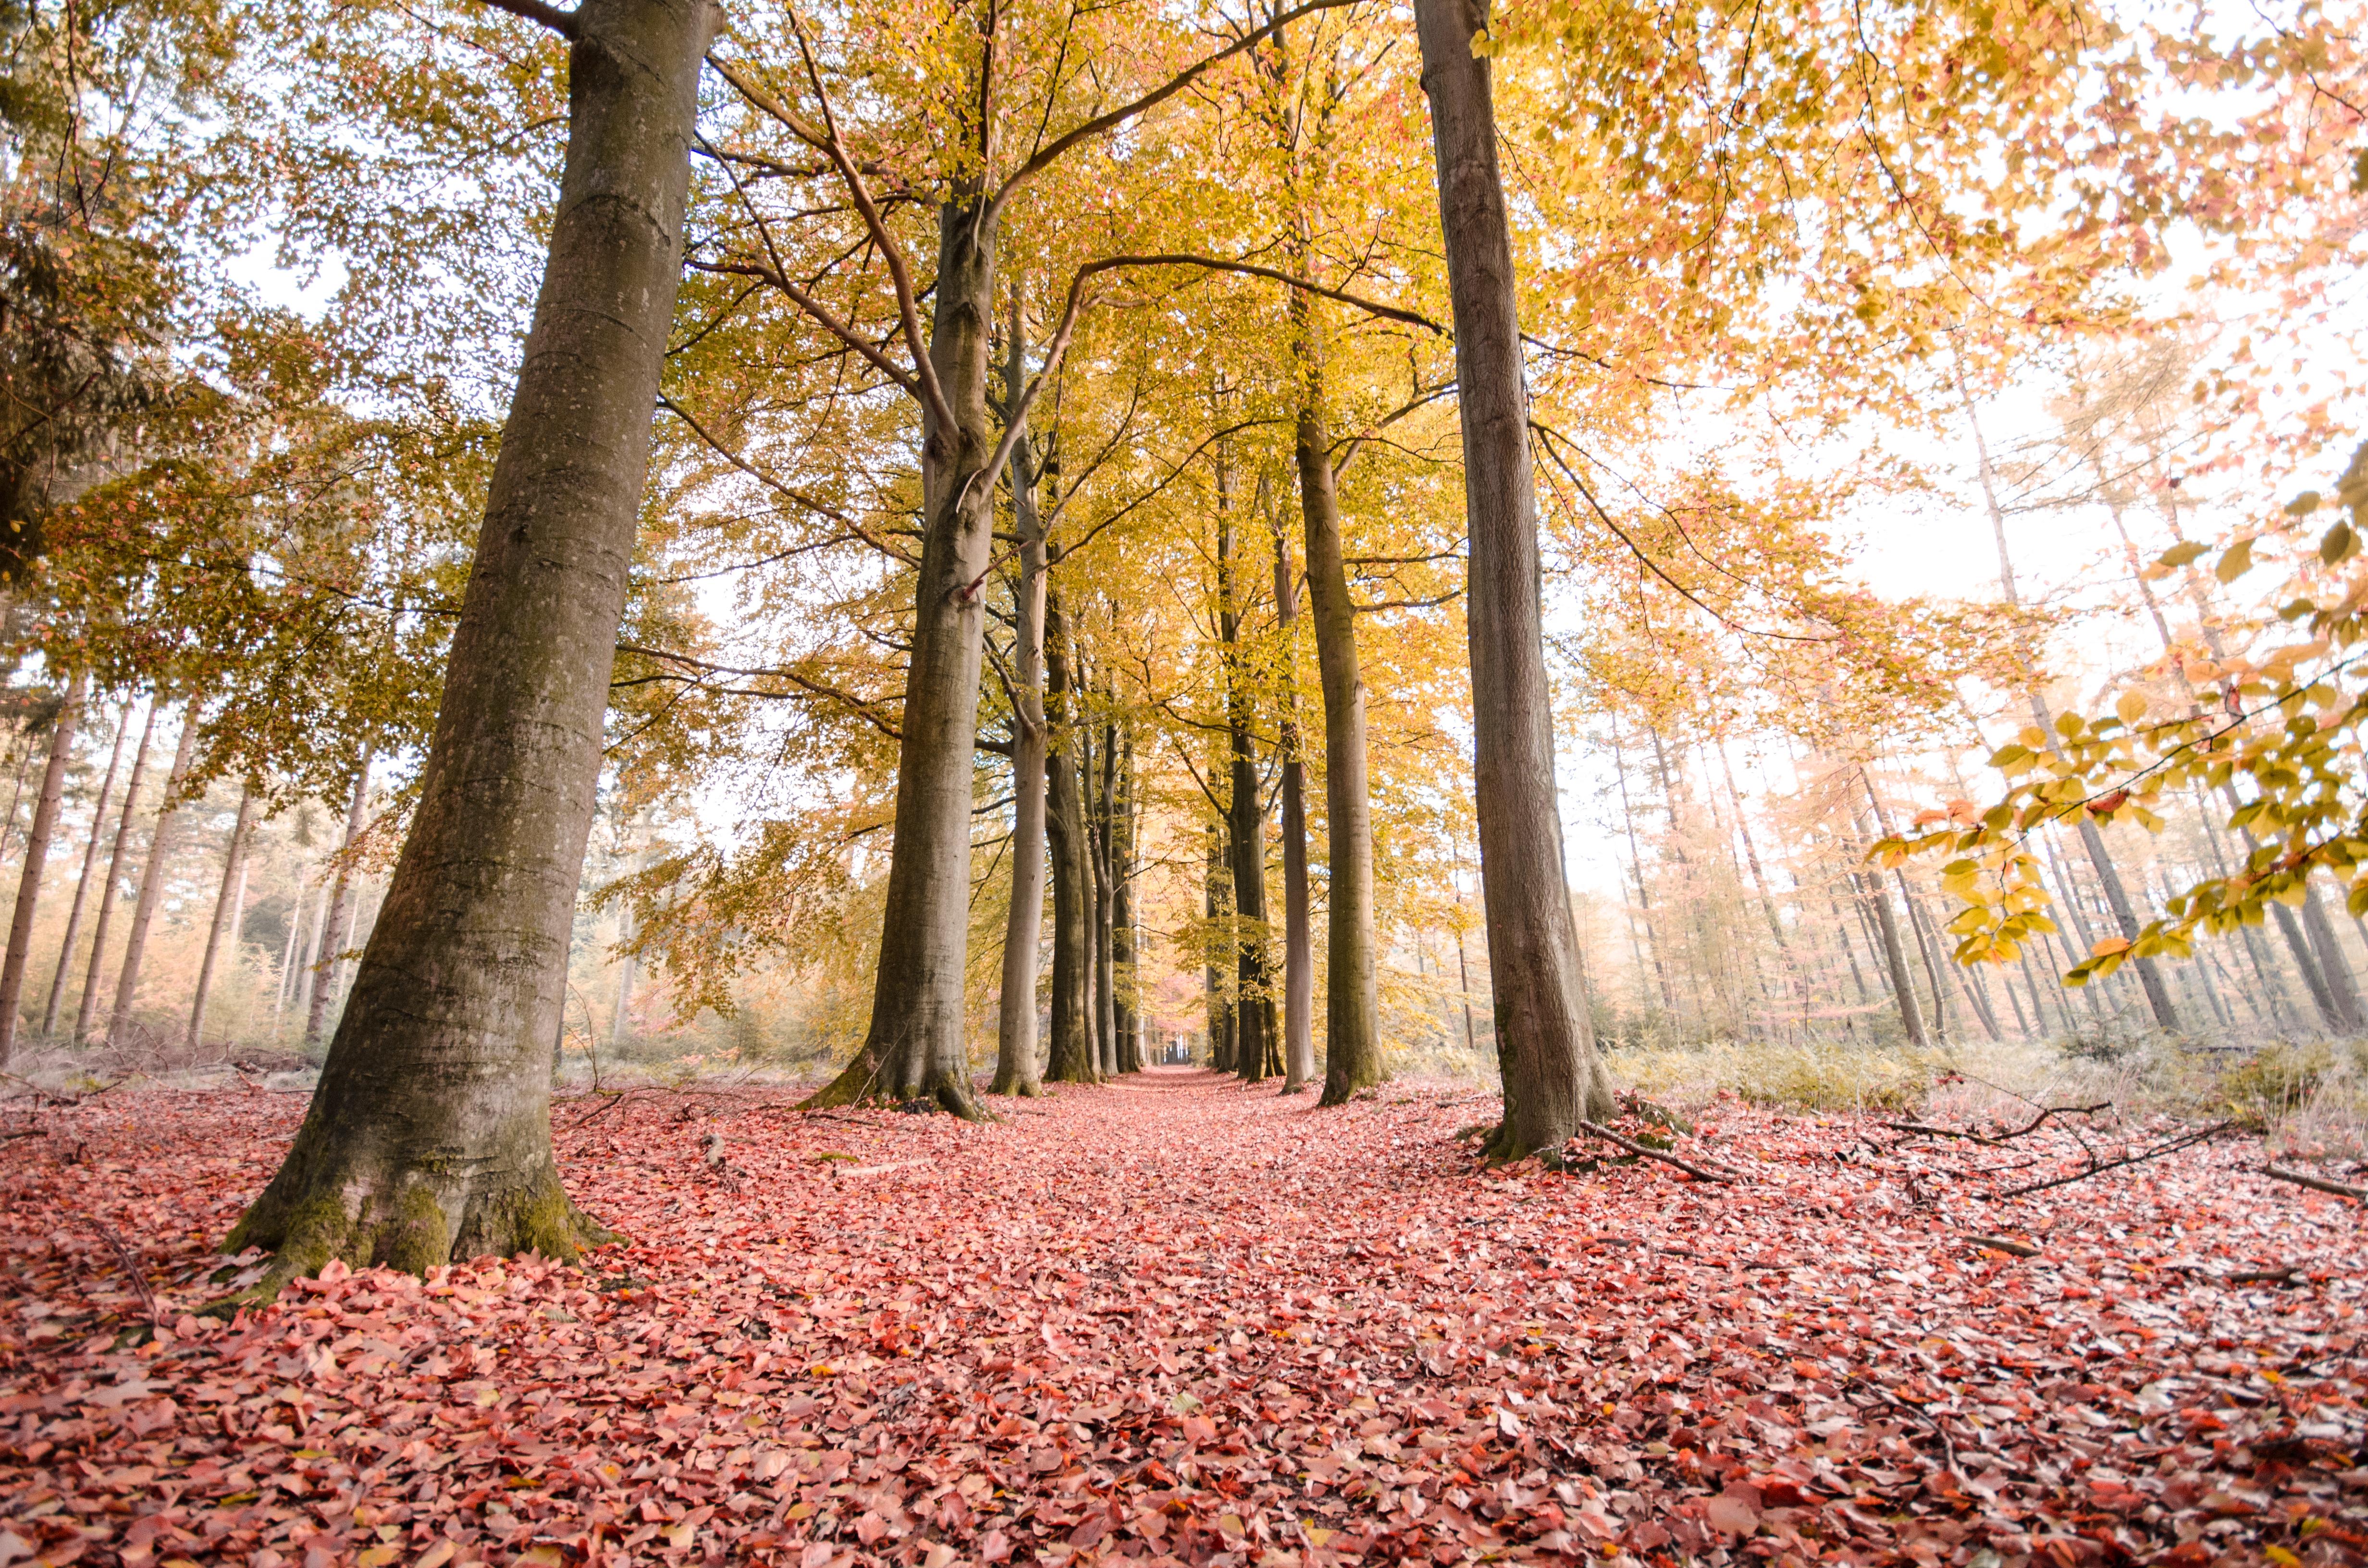 forest-autumn-trees-lane-630773.jpeg (4928×3264)